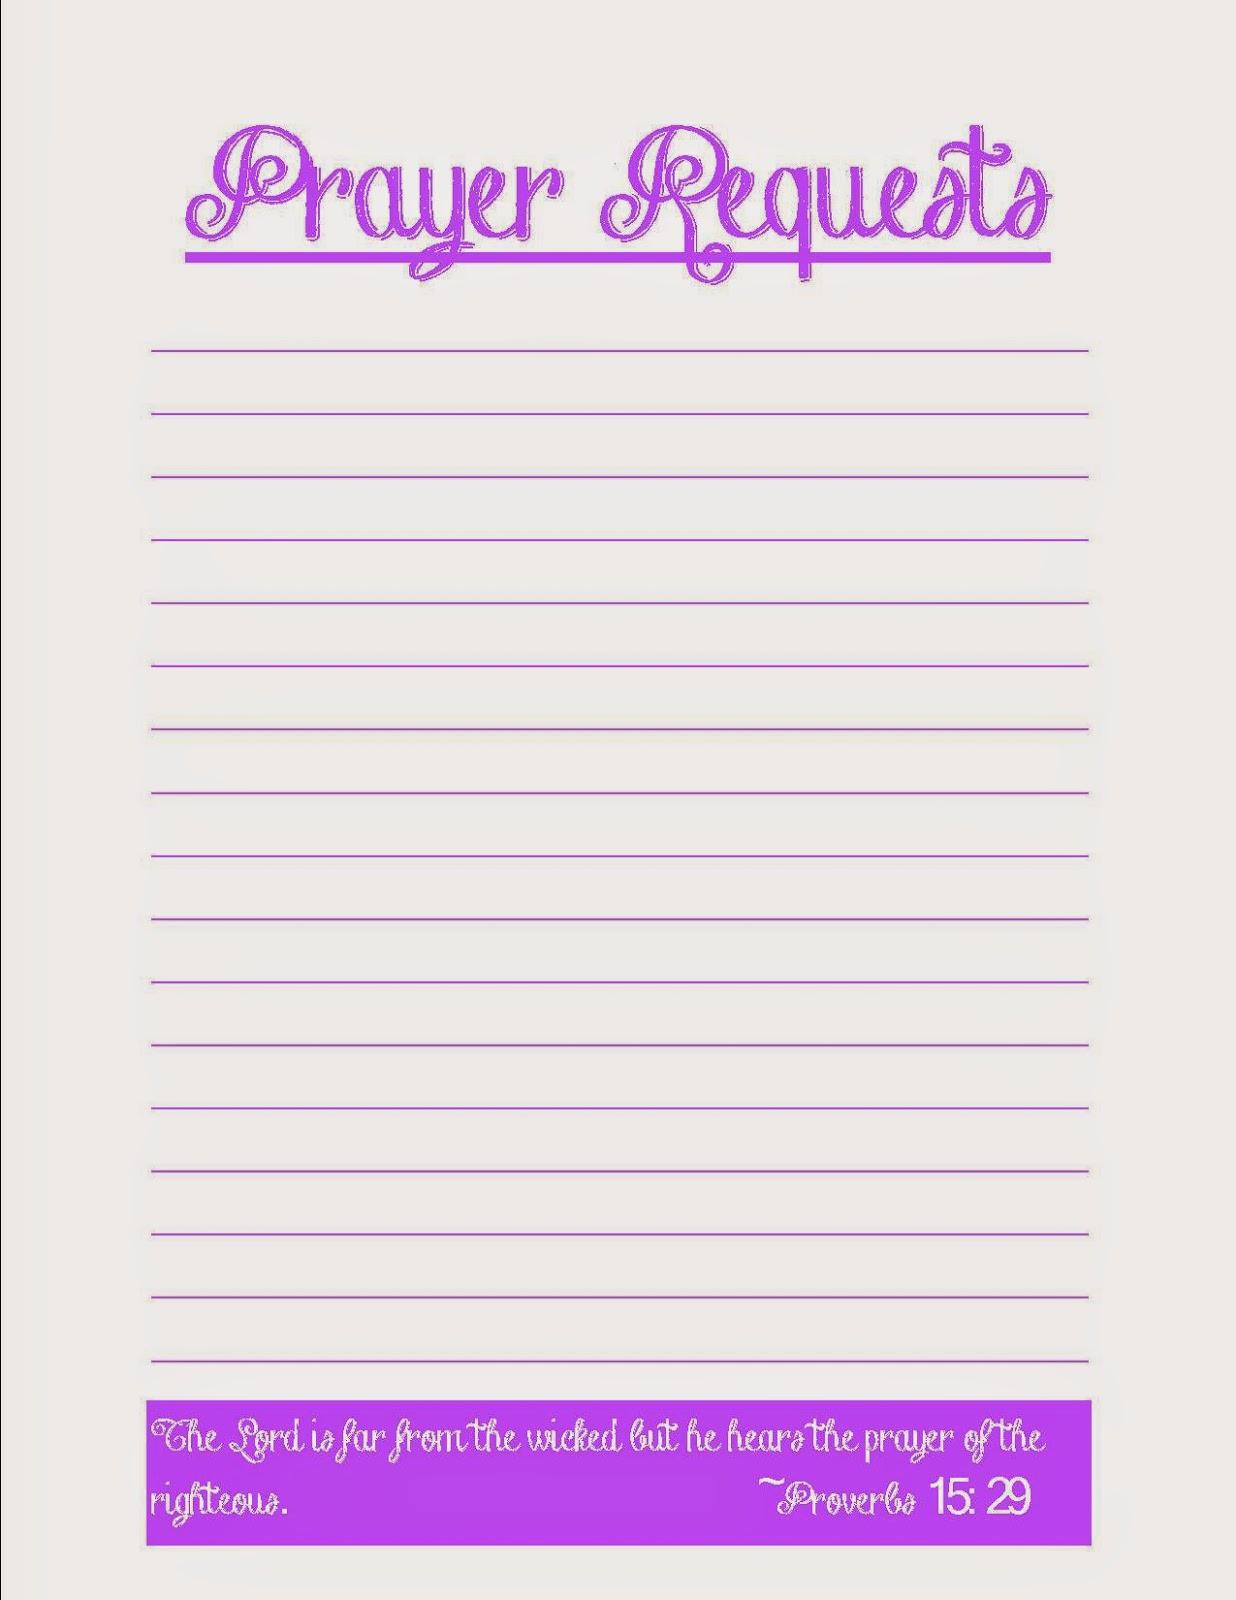 Prayer Request Form | Prayer Request Form Template Basilosaur Us